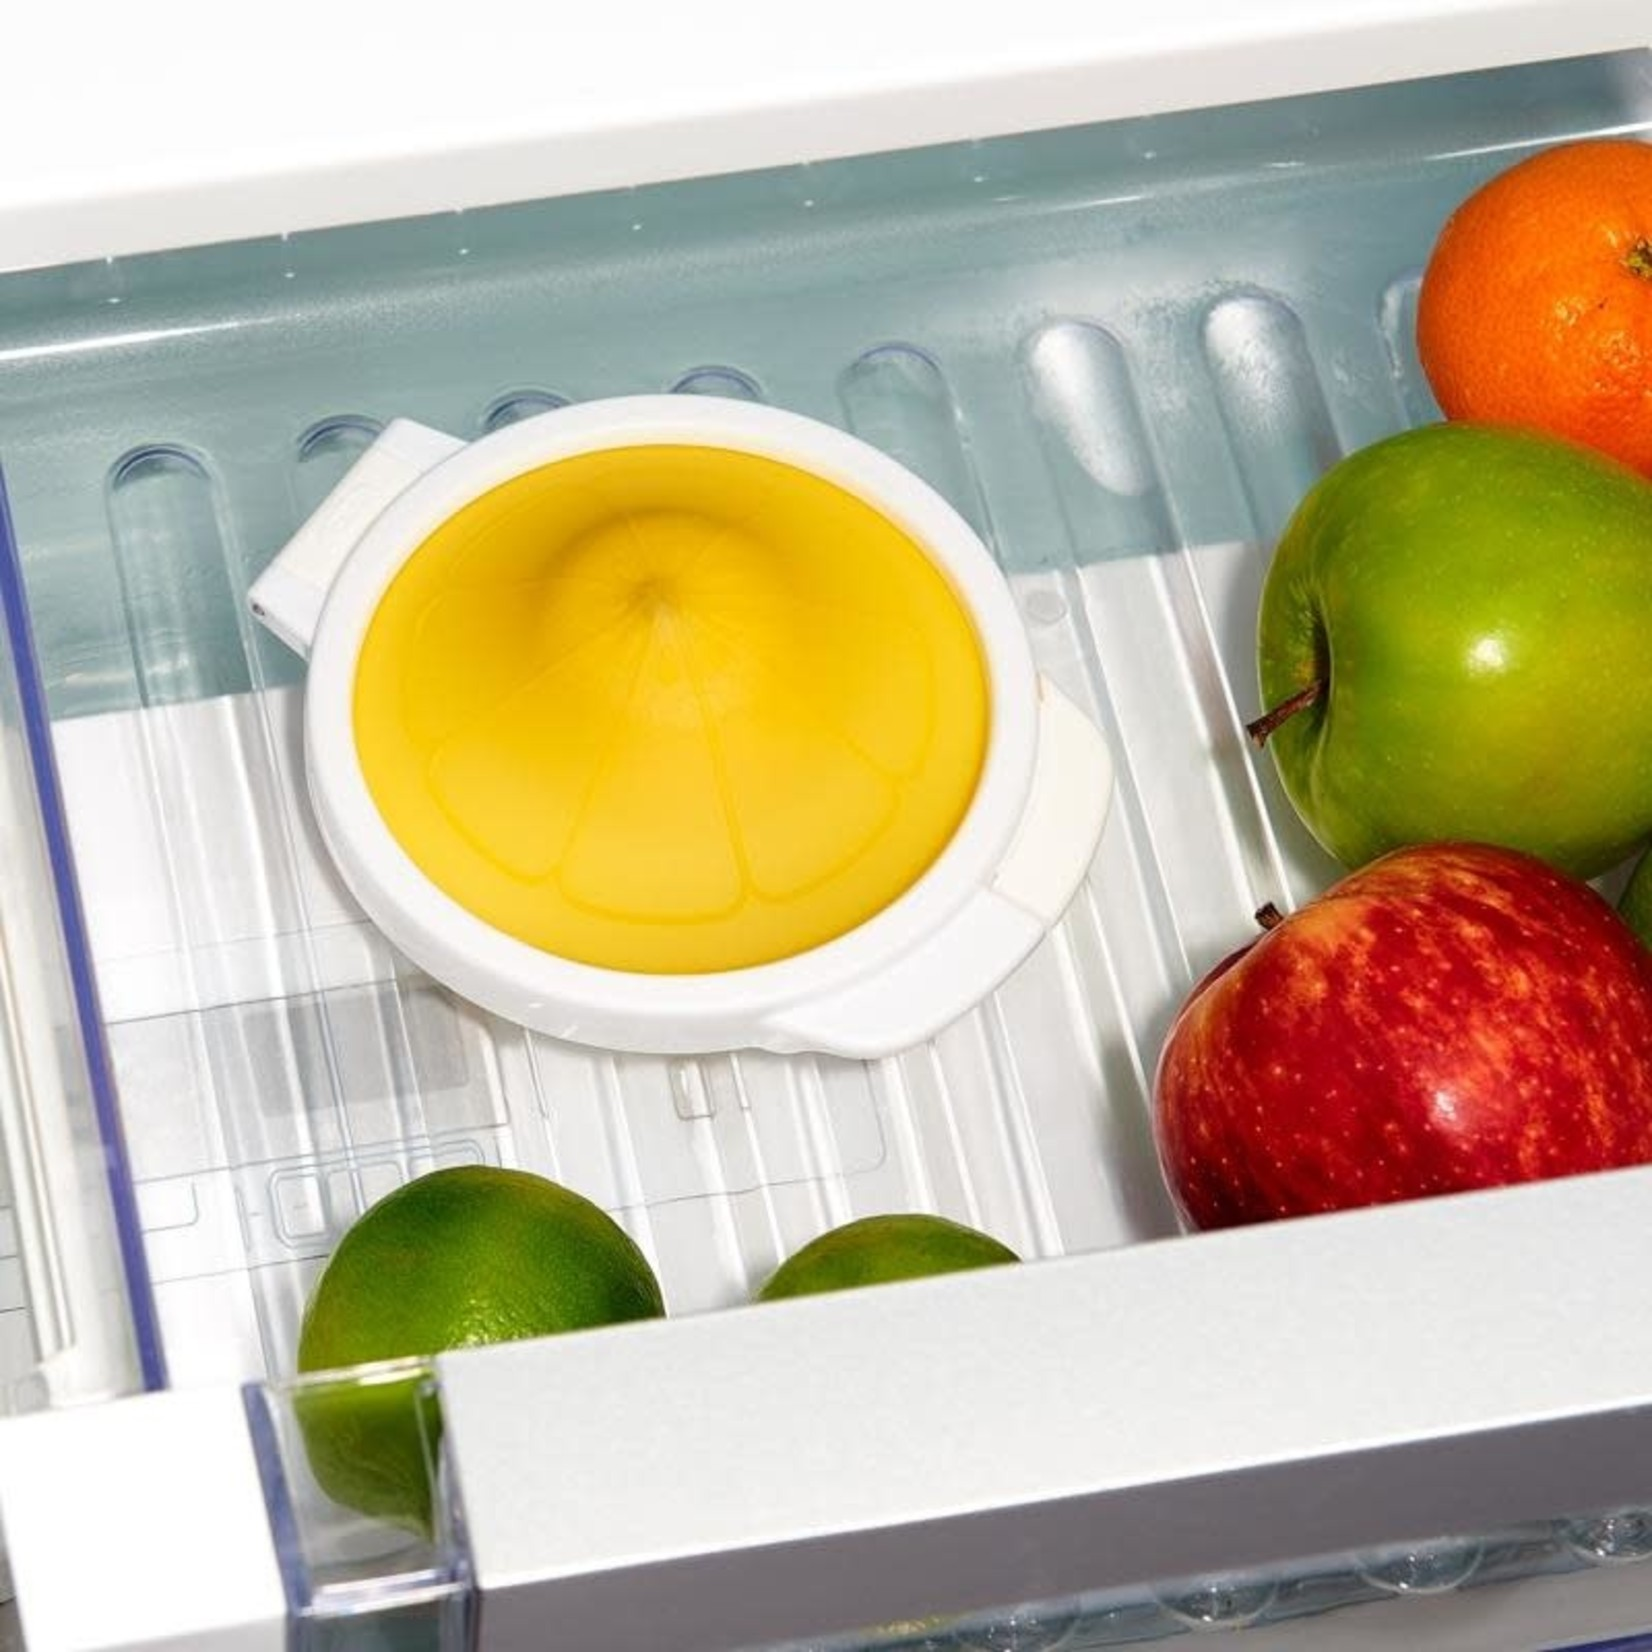 OXO Fruit & Vegetable Keepers